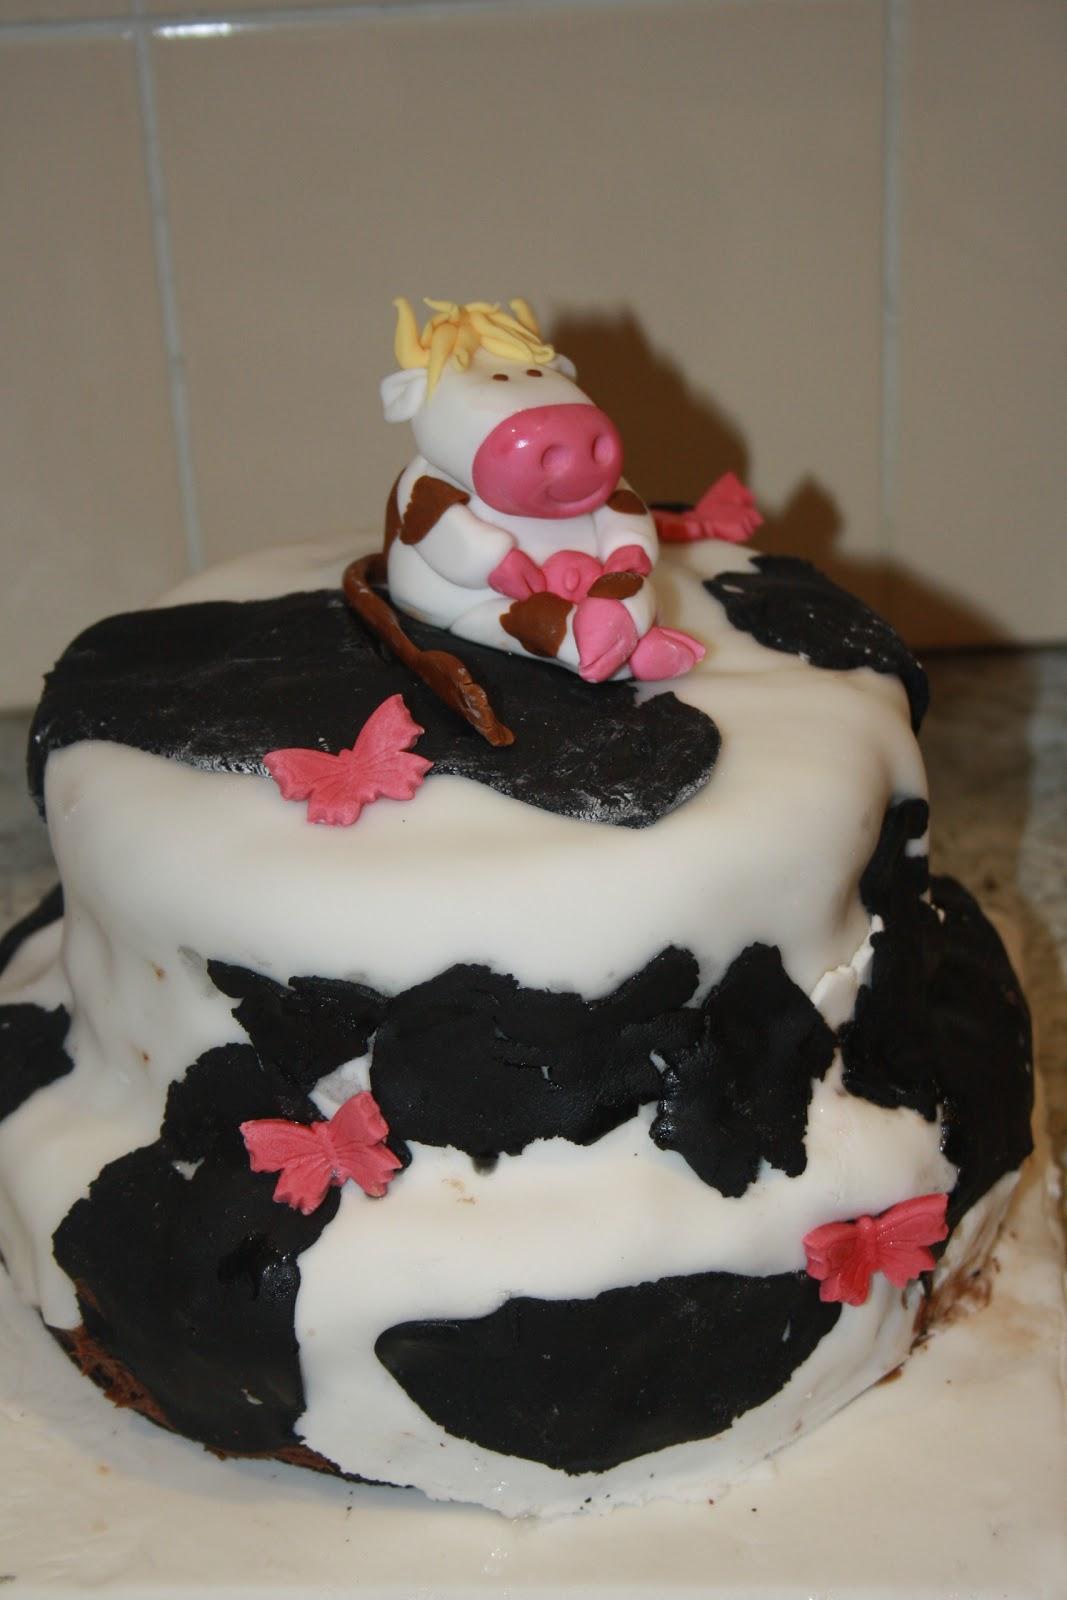 Caroline Makes Two Tiered Cow Print Birthday Cake